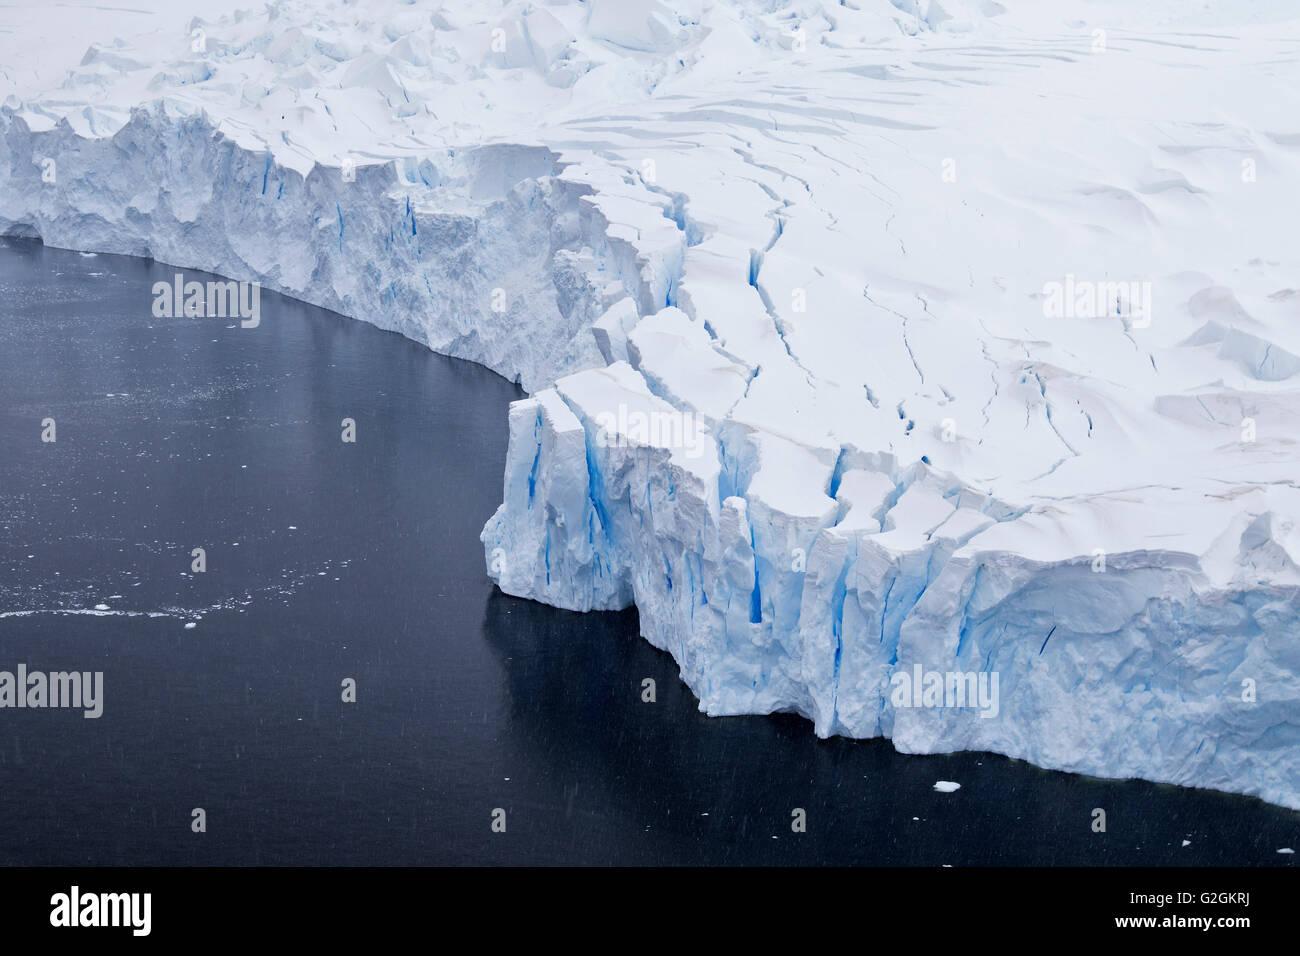 Antarctica aerial iceberg, ice berg, glacier landscape. Neko Harbor, Antarctic Peninsula, Antarctica. - Stock Image